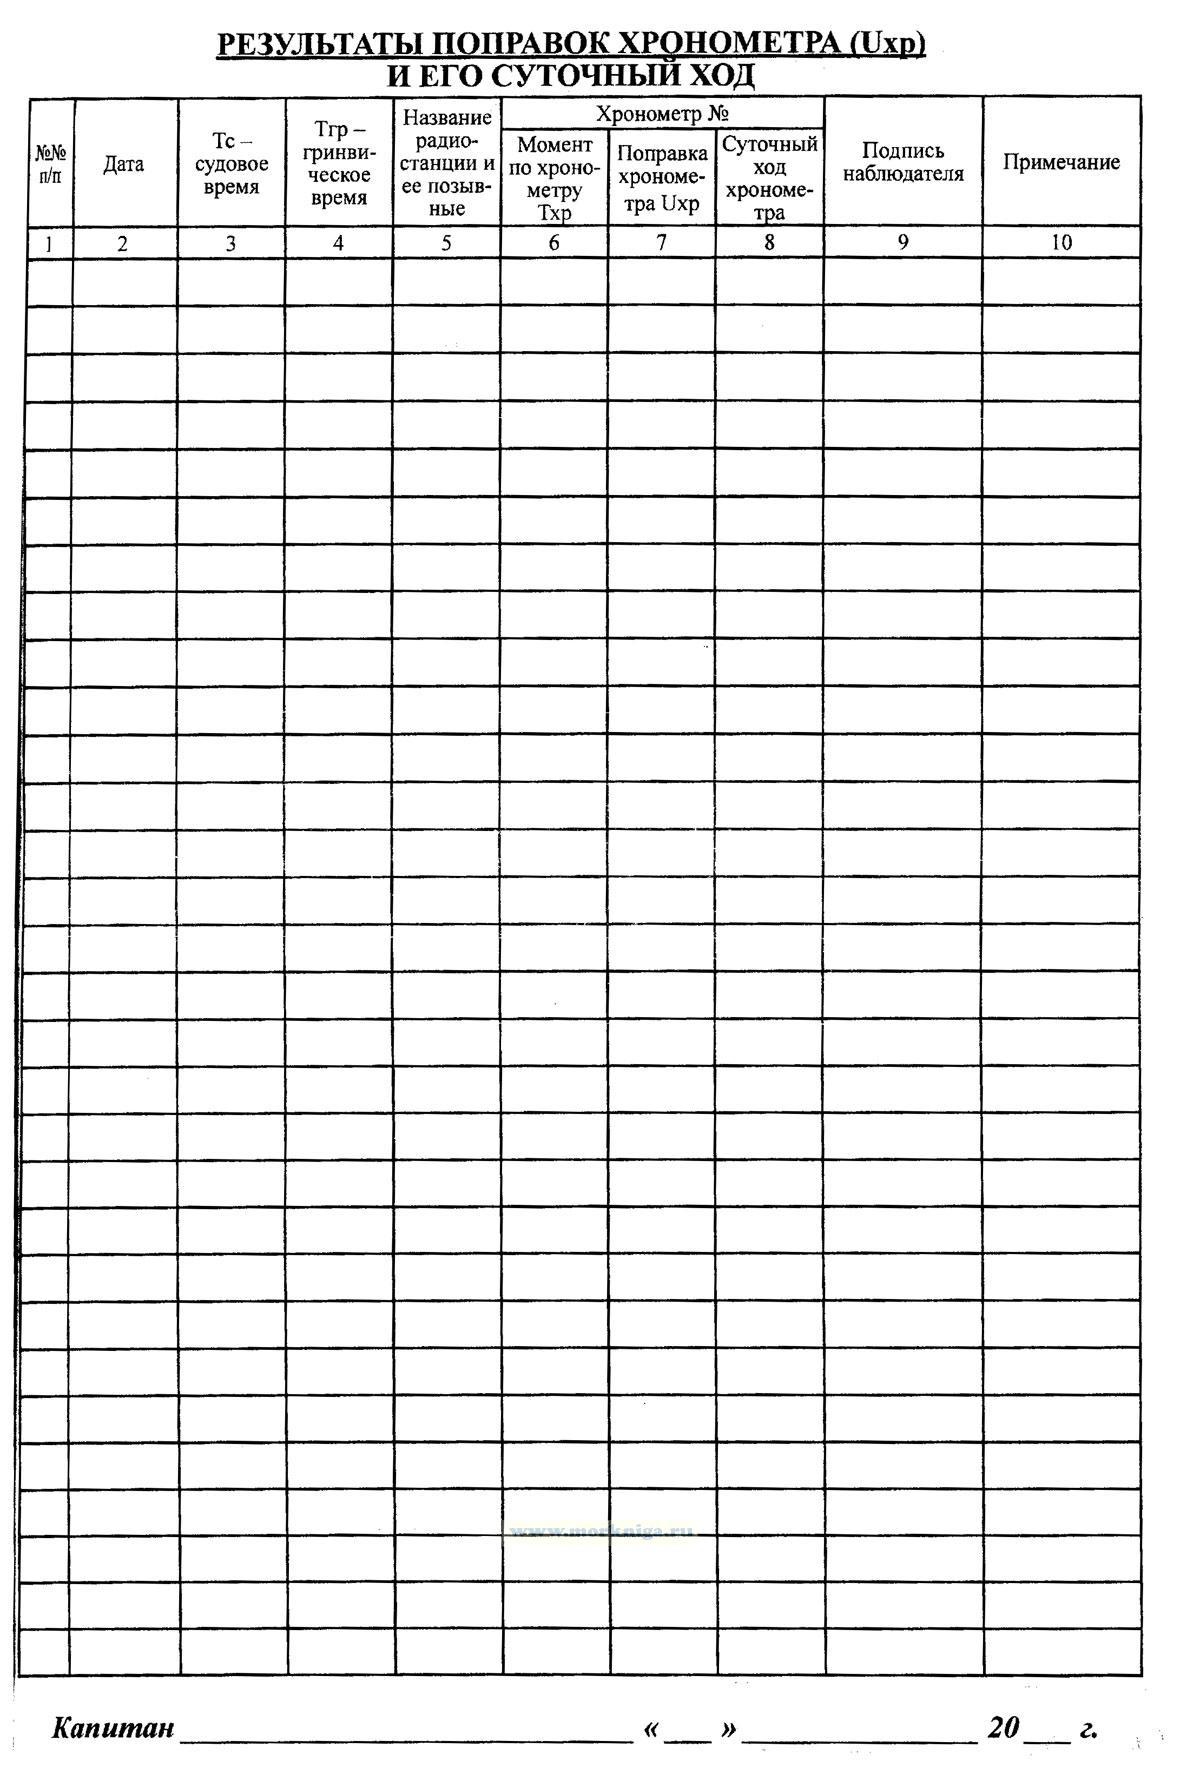 Журнал поправок хронометра (Uxp) Chronometer rate book